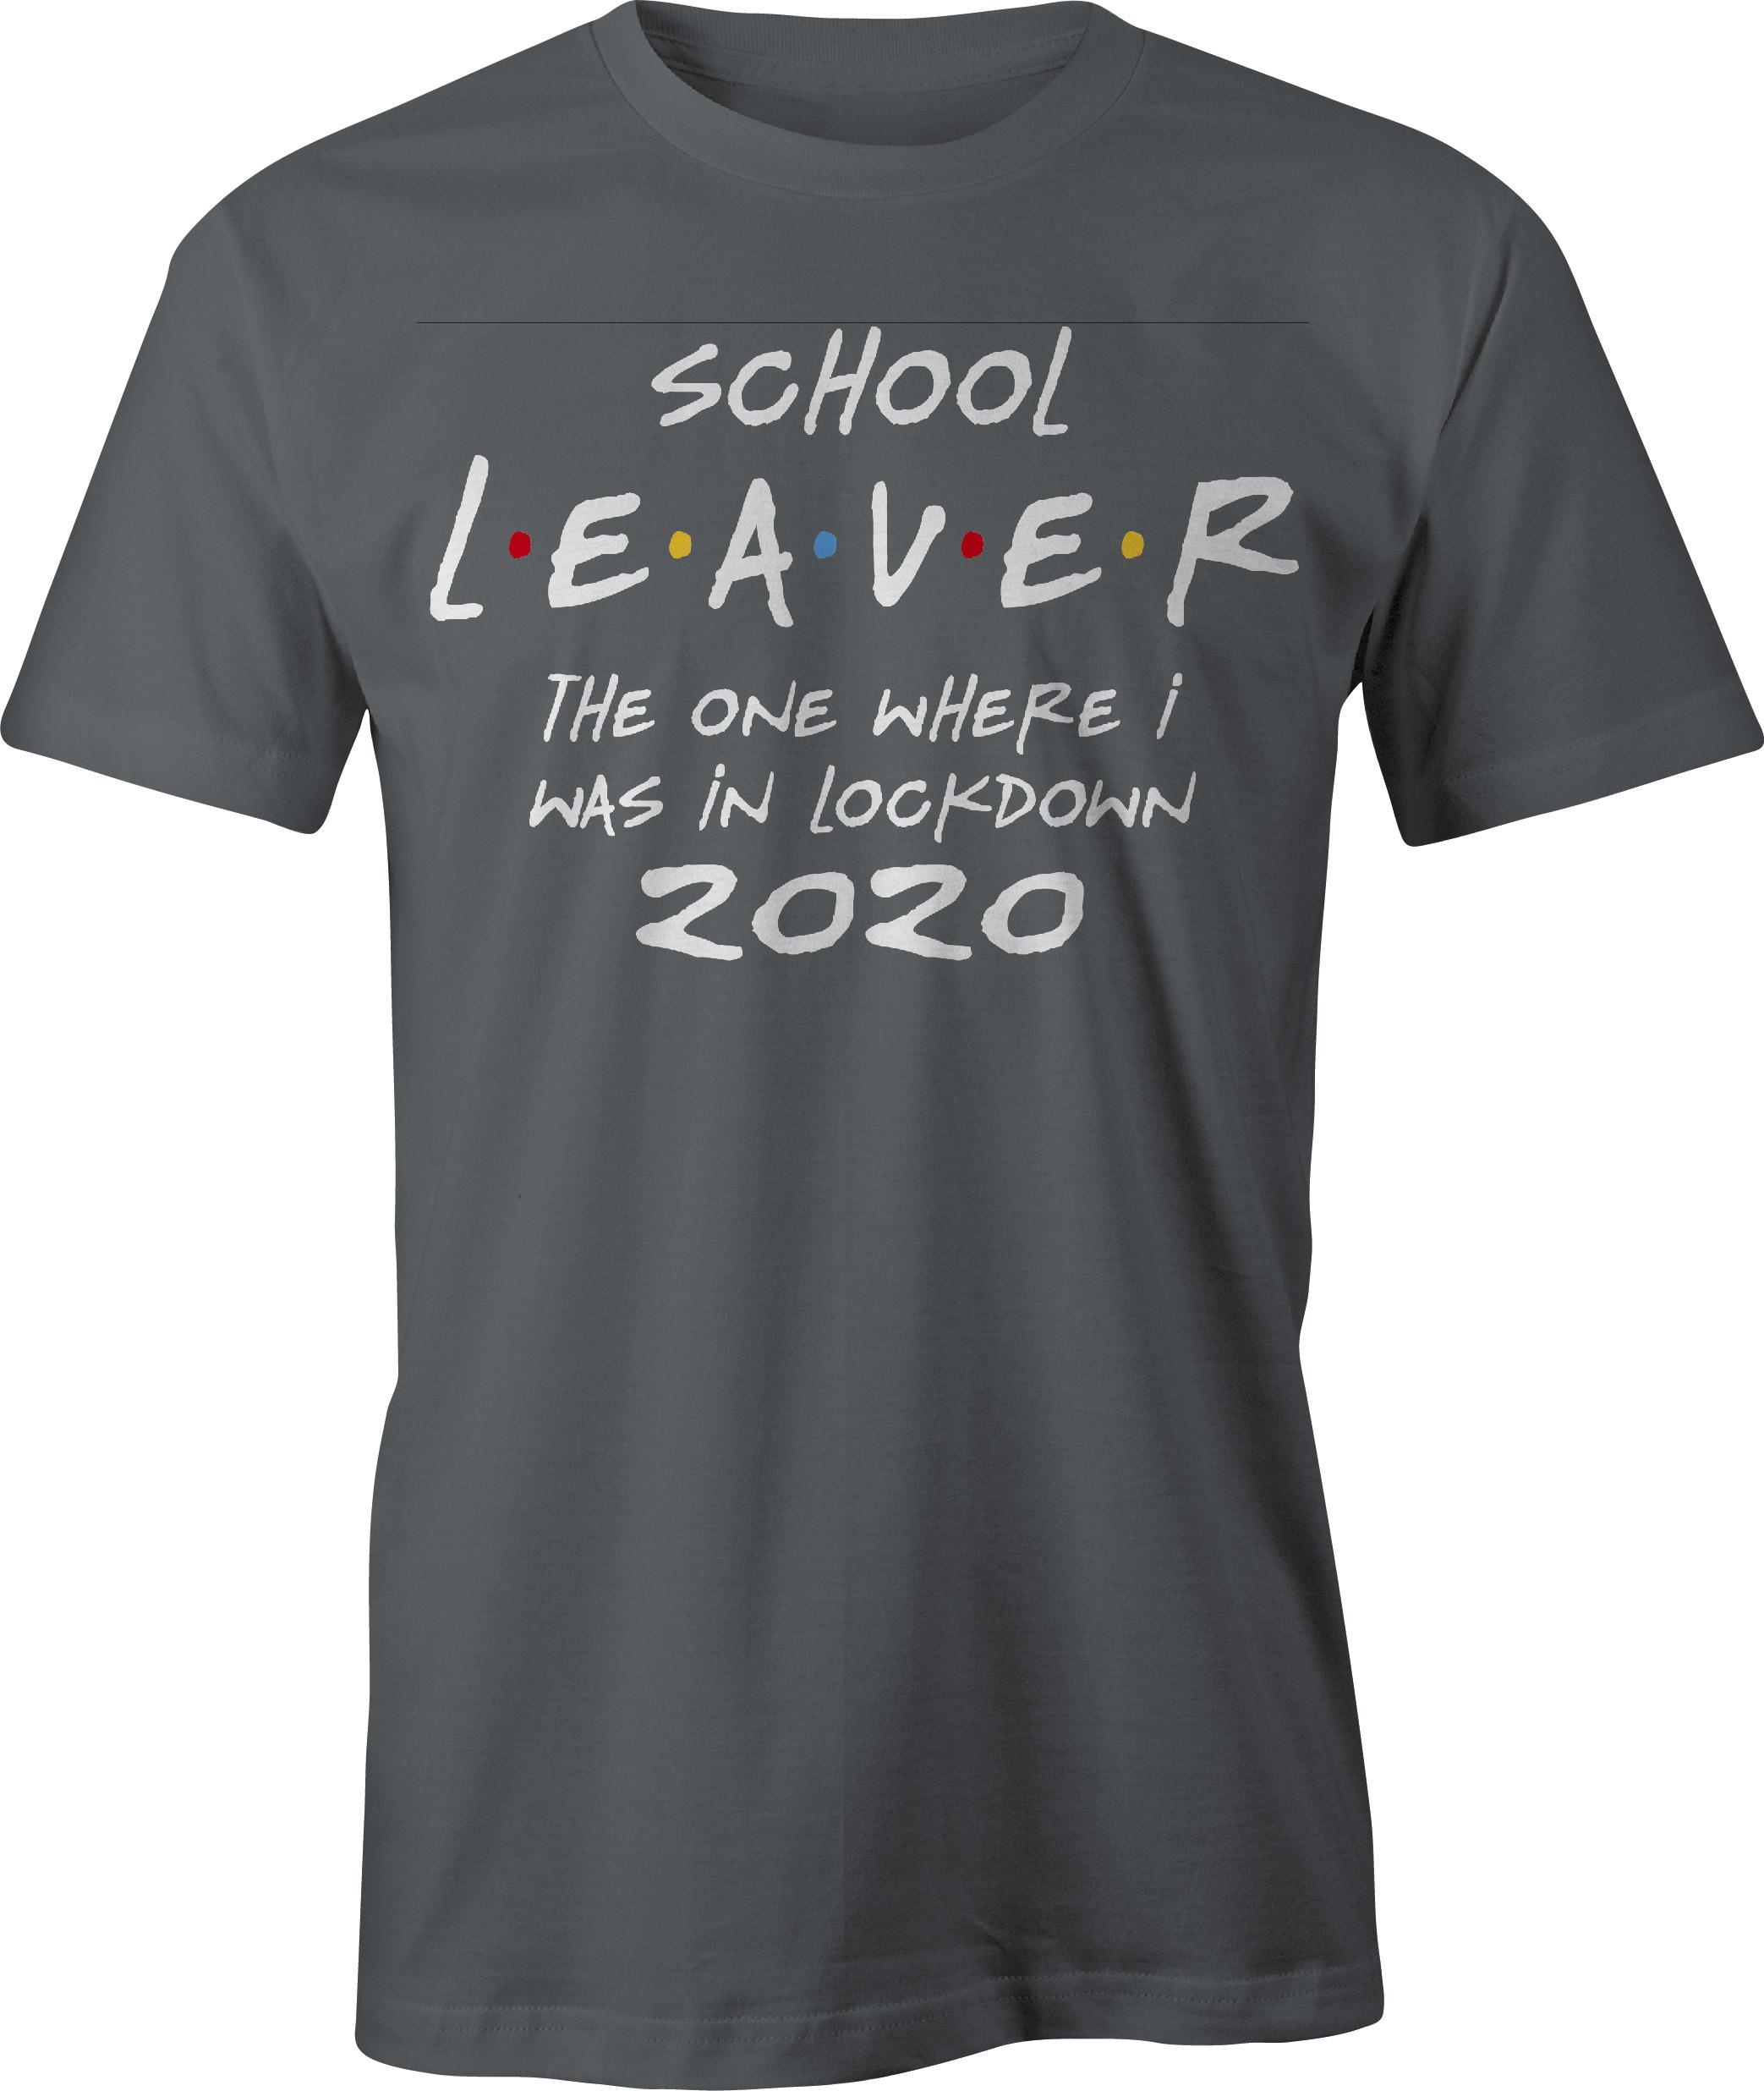 School leaver in lockdown t-shirt - charcoal